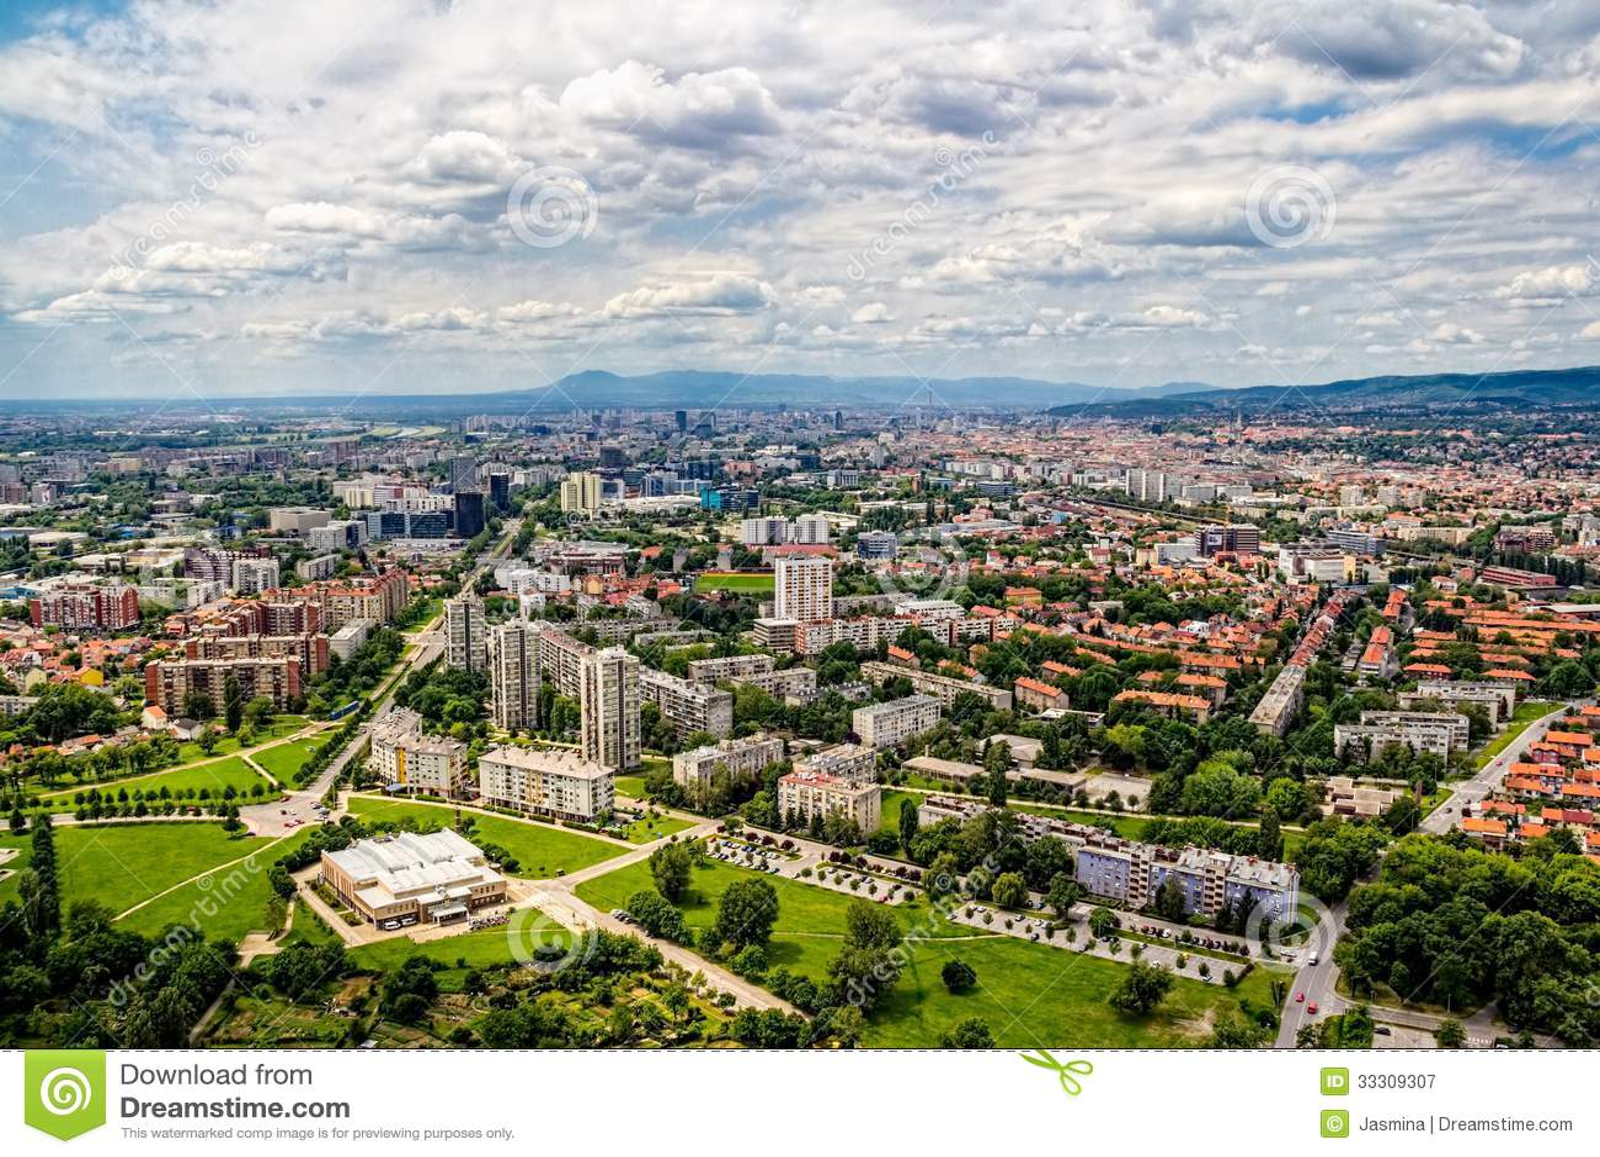 free online dating croatia city zagreb